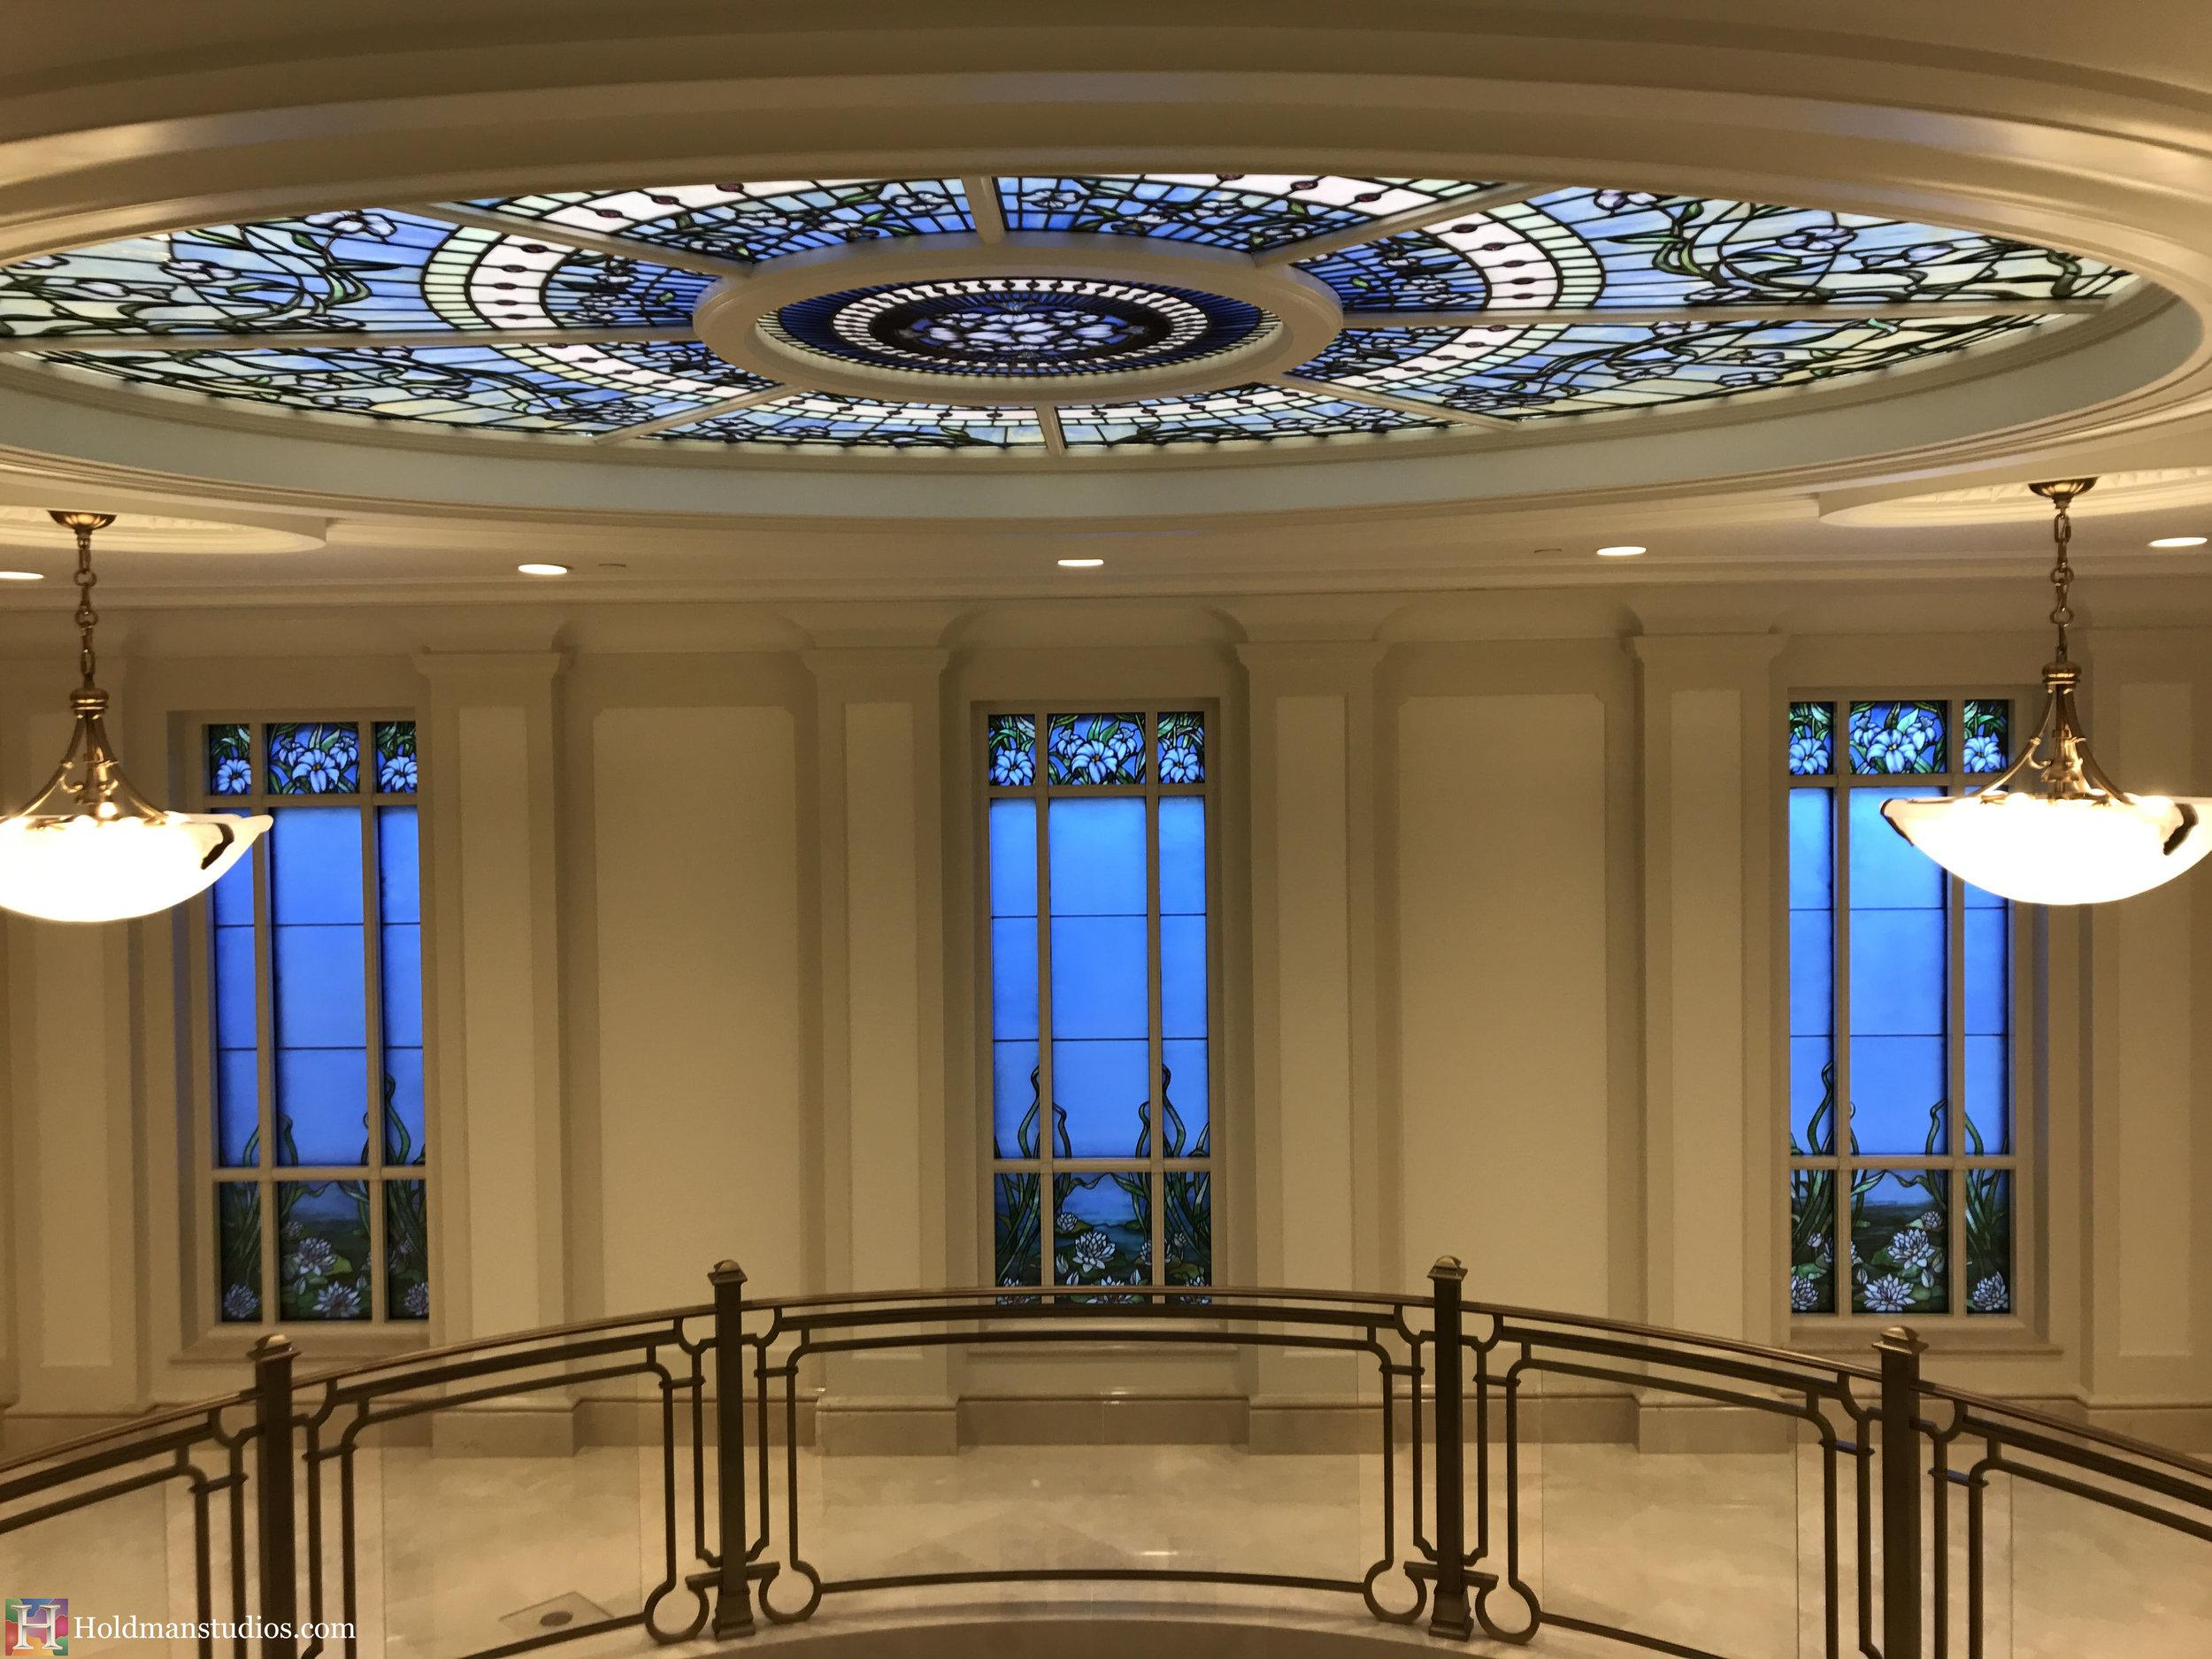 Holdman-Studios-Stained-Glass-Paris-LDS-Temple-Madonna-Martagon-Water-Lily-Flowers-Leaves-Sun-Moon-Stars-Skylight-Windows.jpg